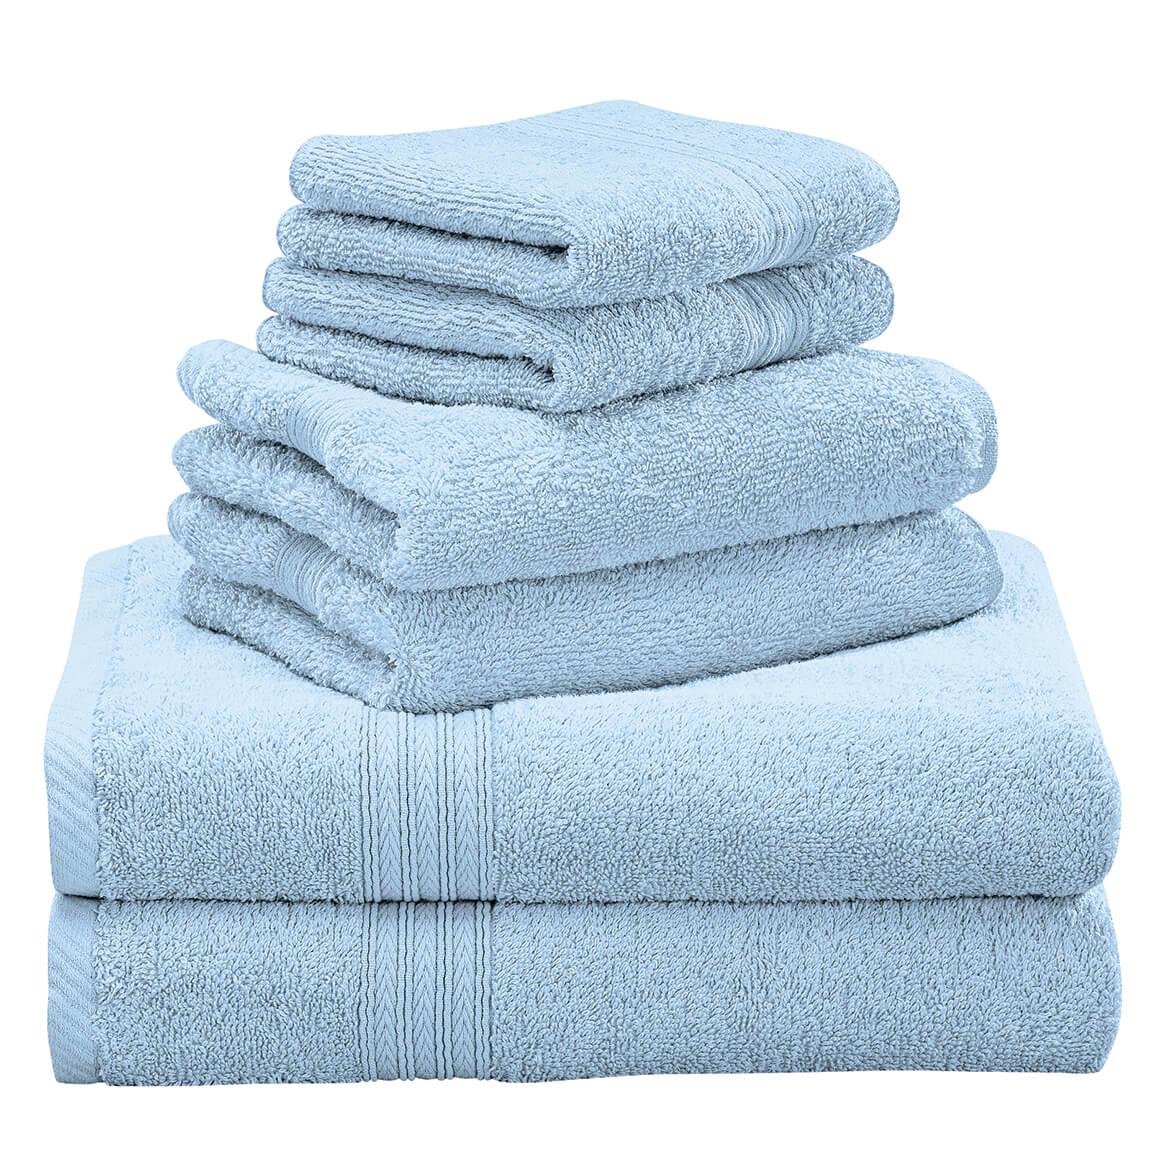 Classic Spa 6-Piece Towel Set by OakRidge™-367489